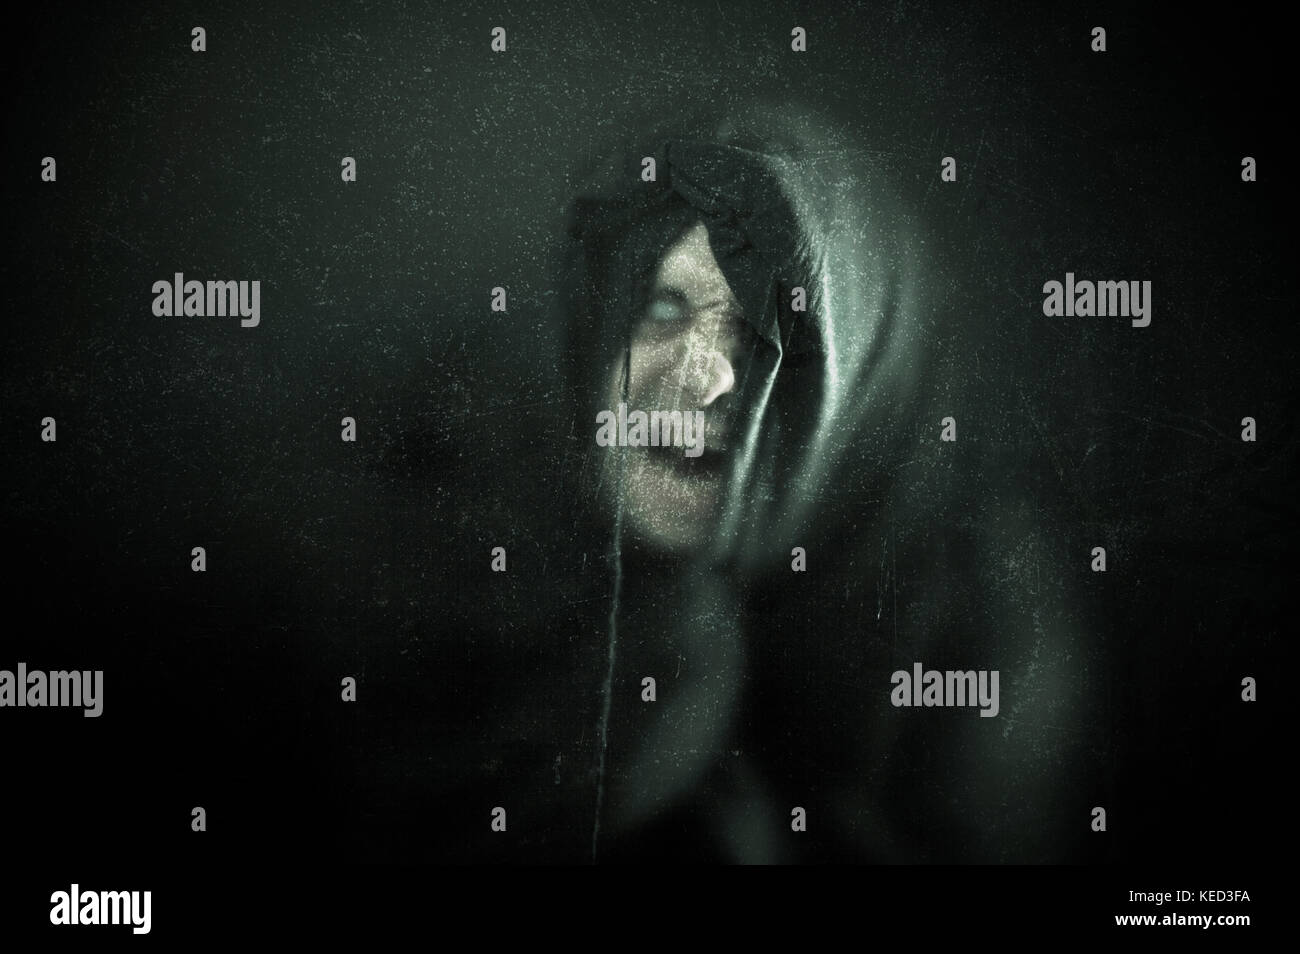 Wütend ghost Abbildung in der Dunkelheit Stockbild